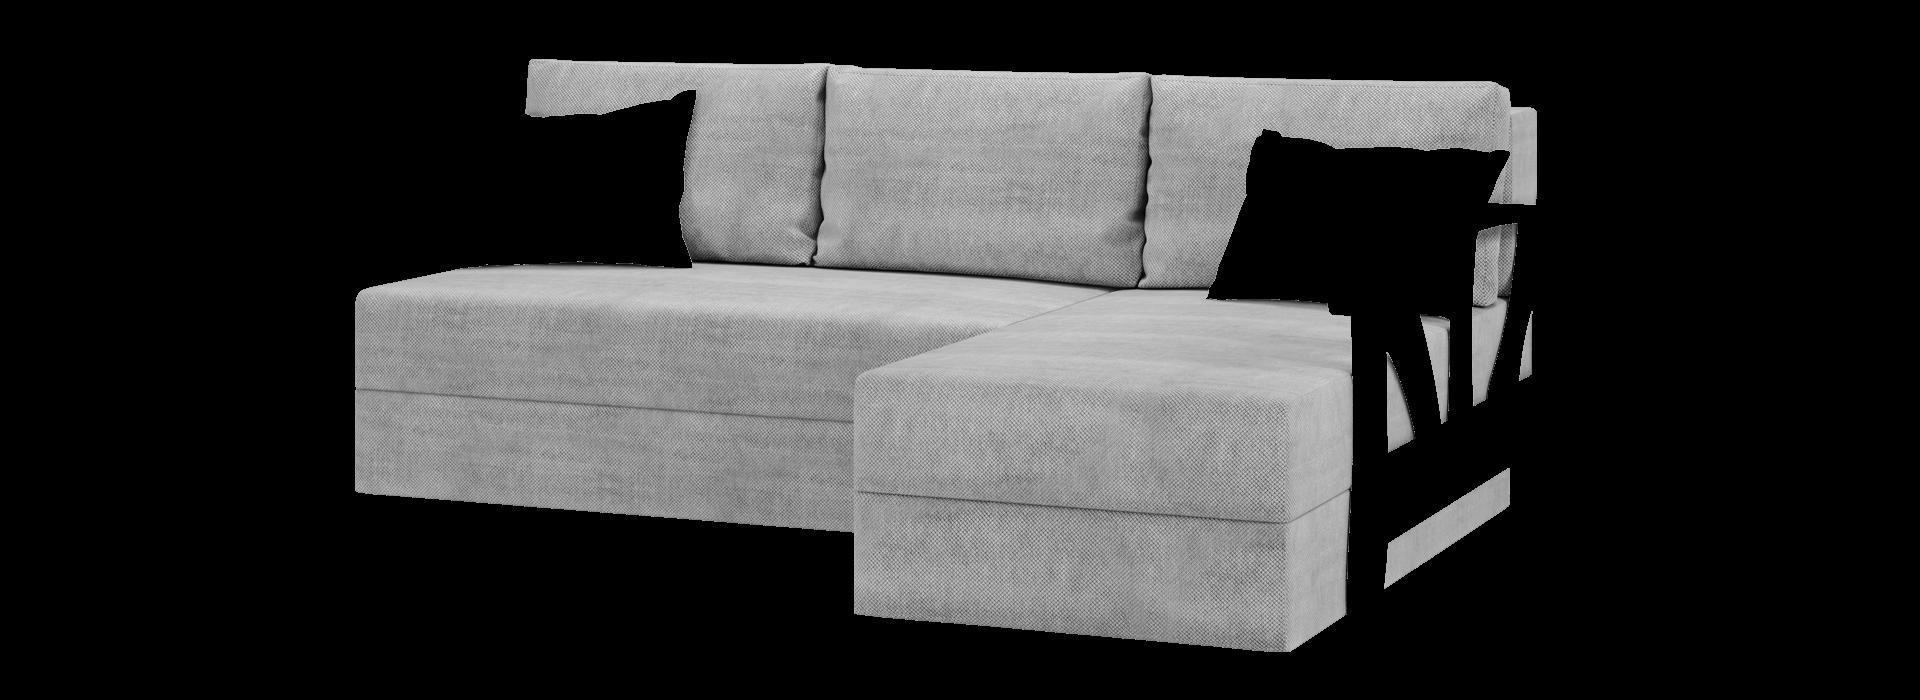 Тамми-5 угловой диван - маска 2